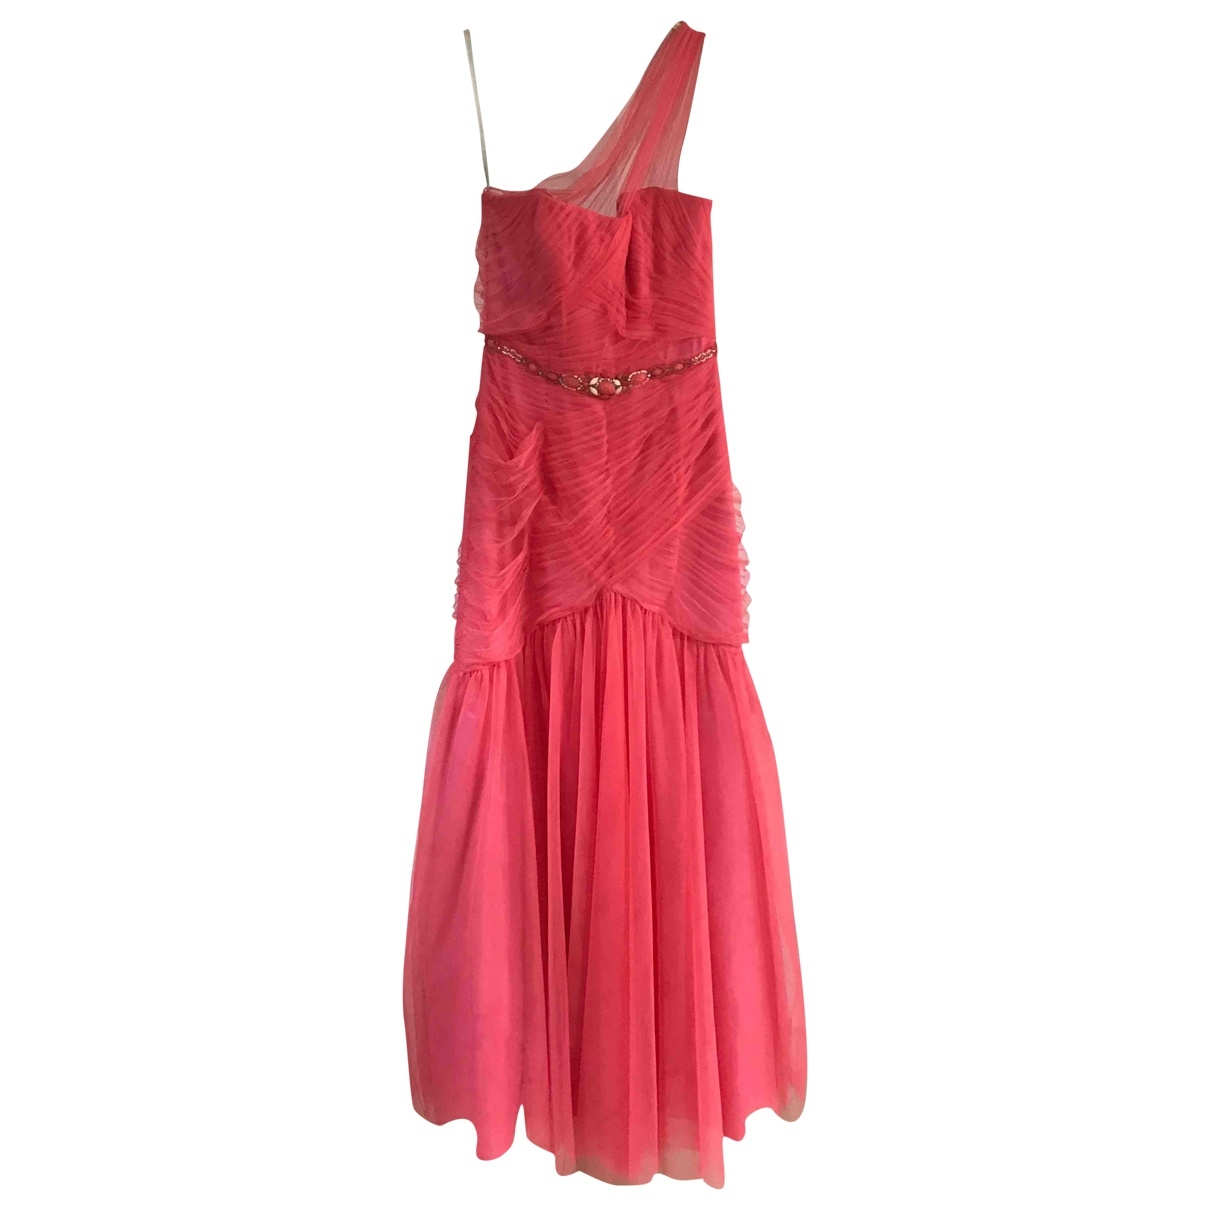 Monique Lhuillier \N Kleid in  Rosa Polyester